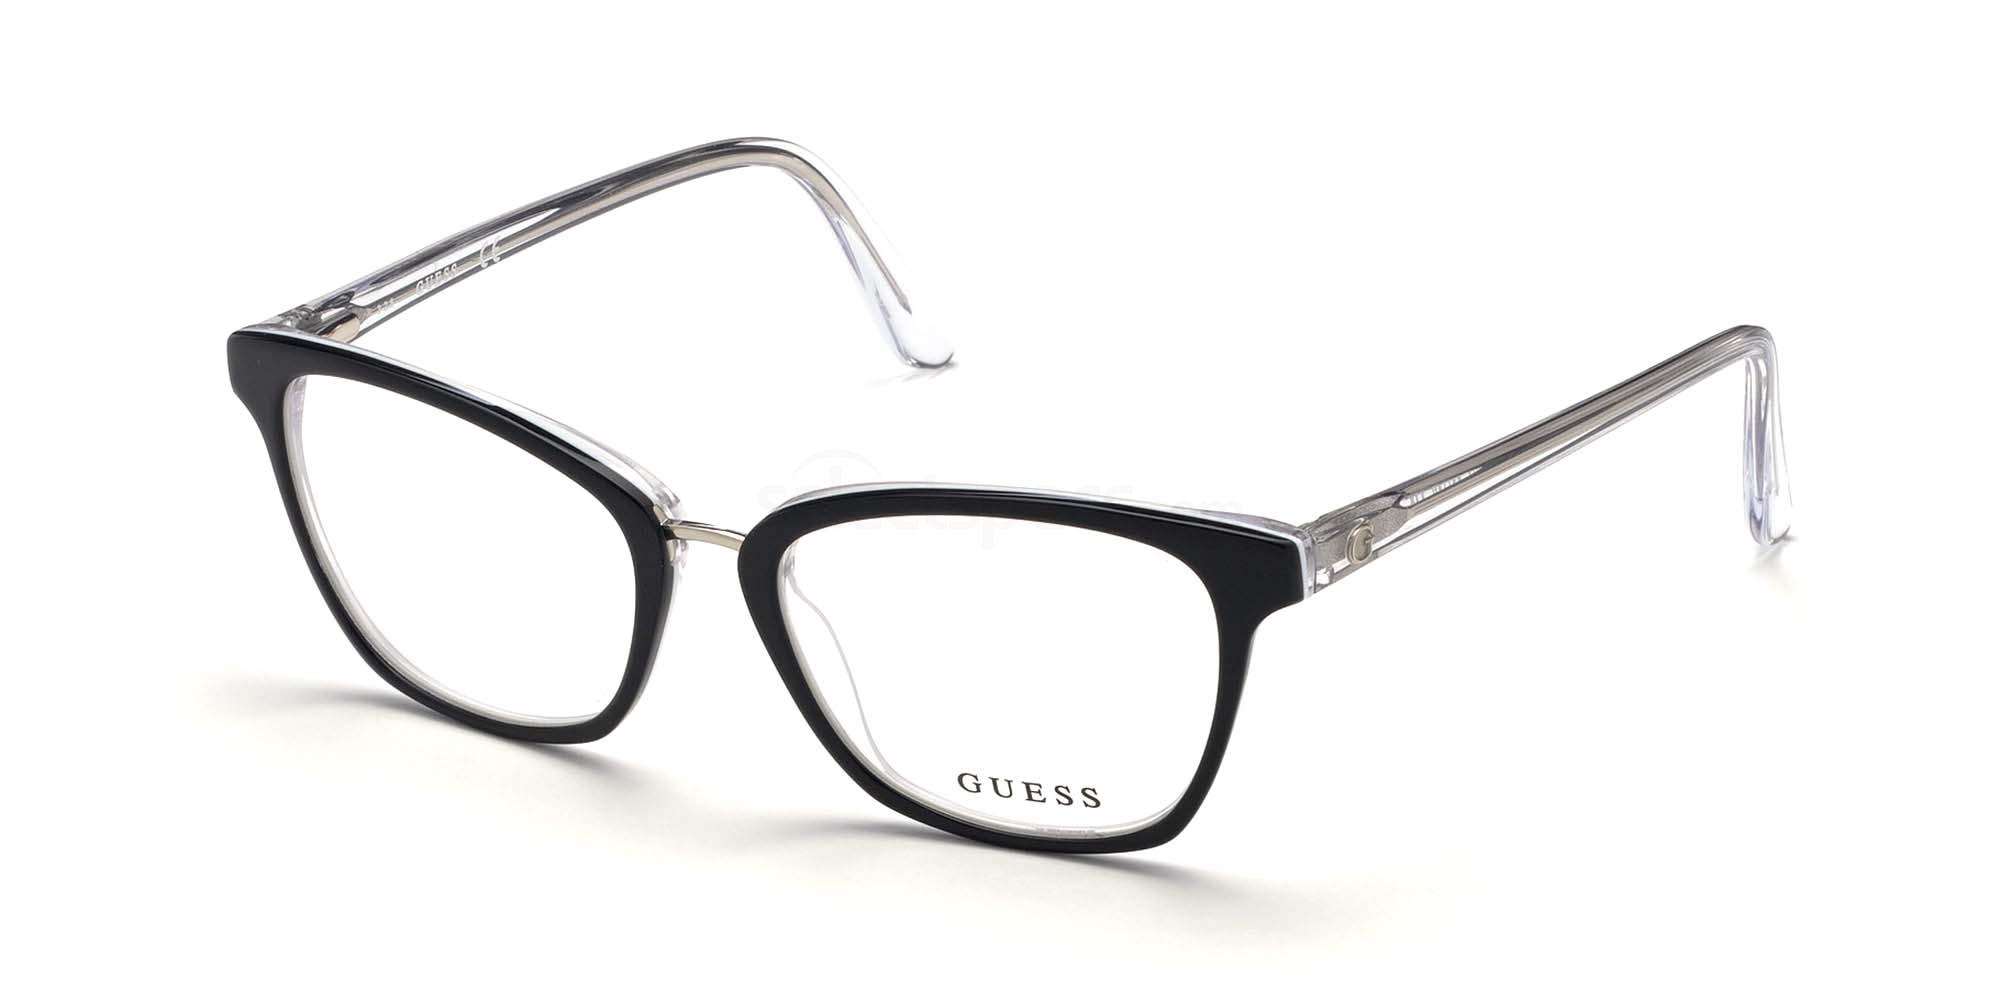 003 GU2733 Glasses, Guess